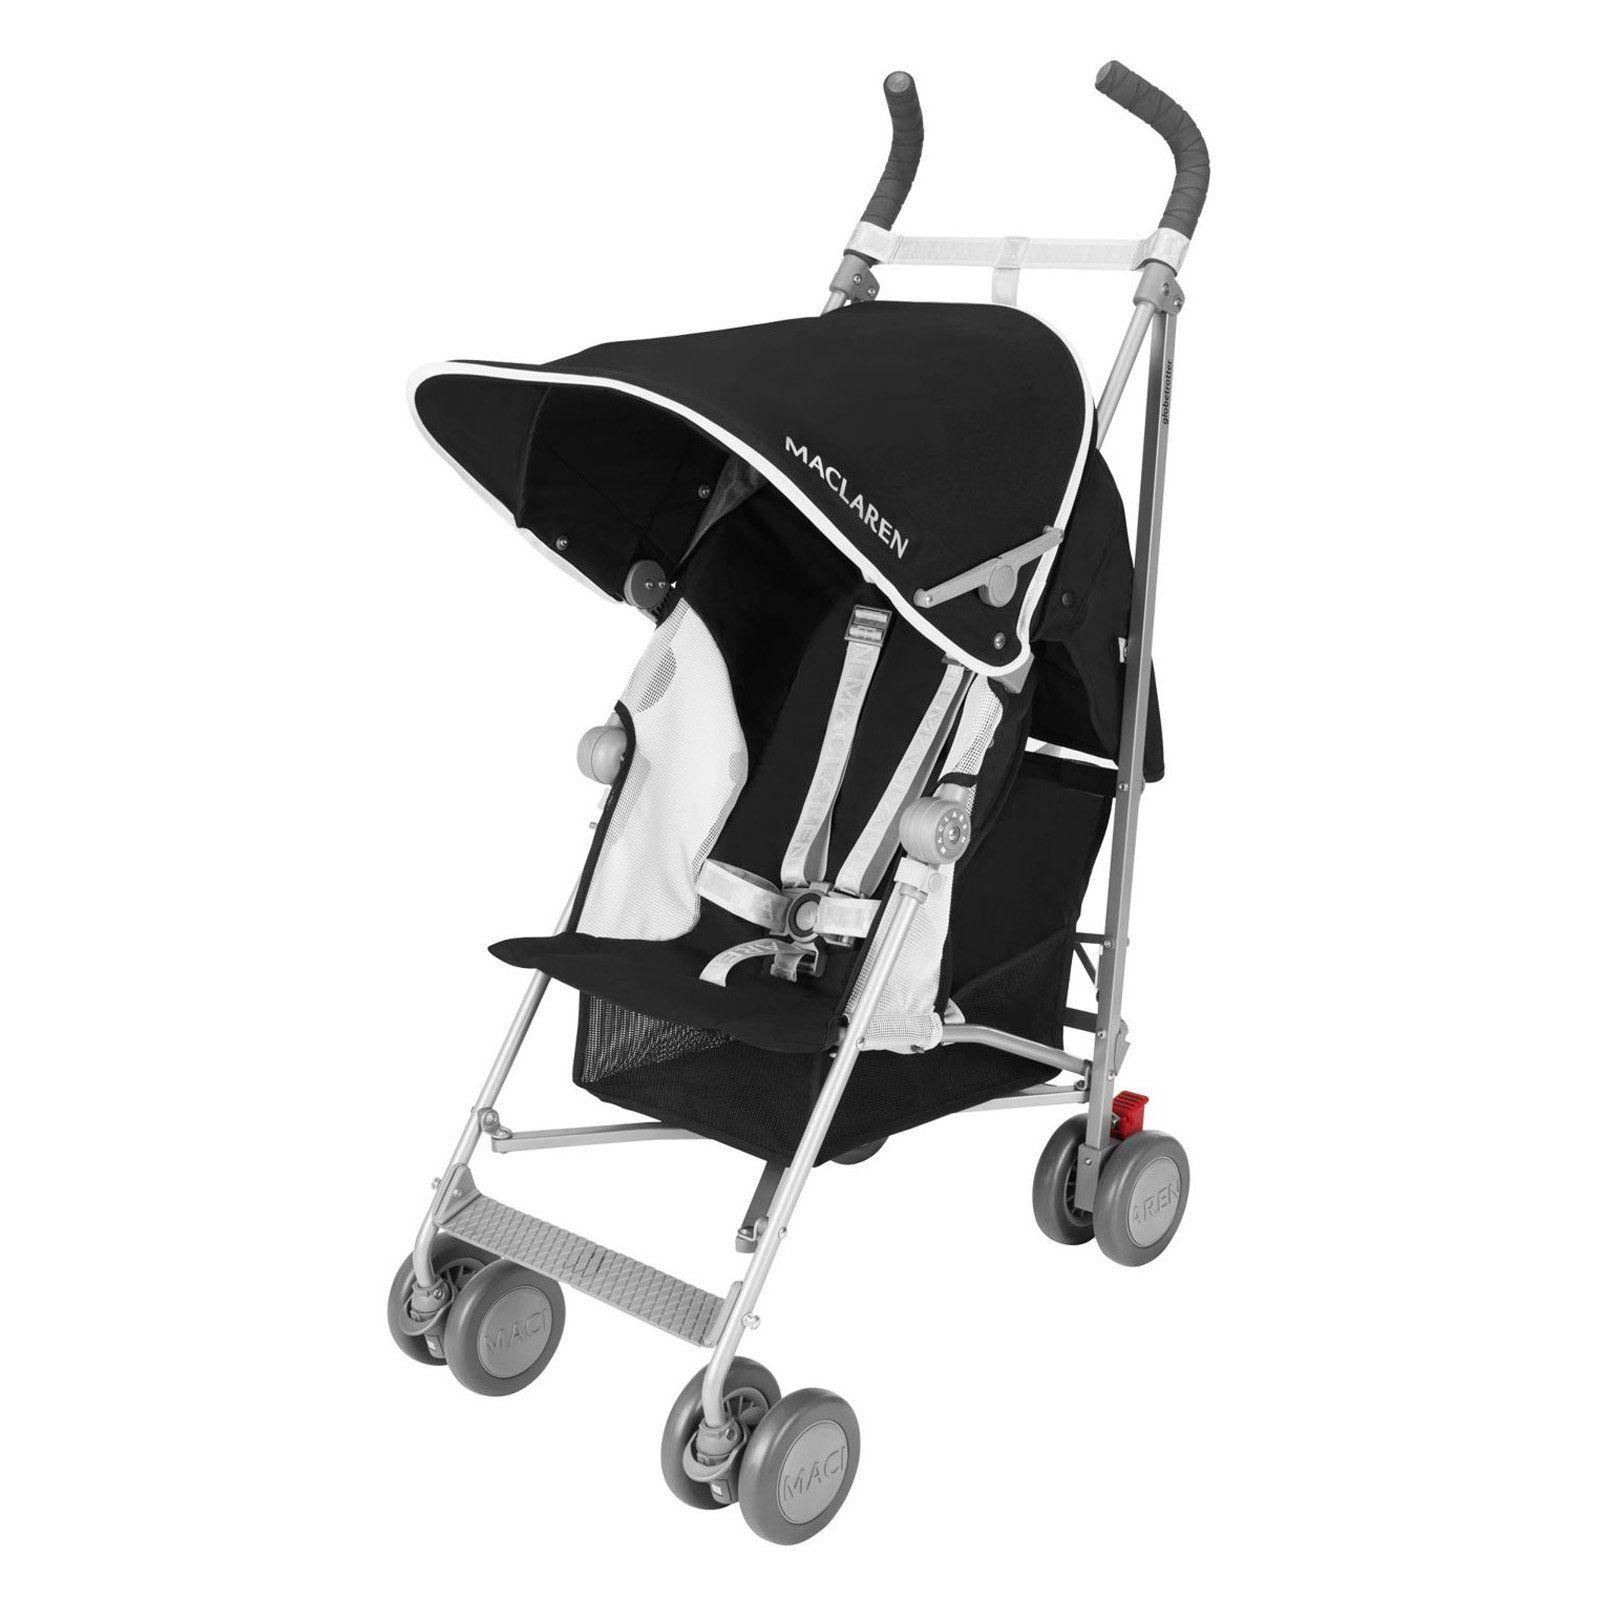 Maclaren Globetrotter Lightweight Stroller Black/White